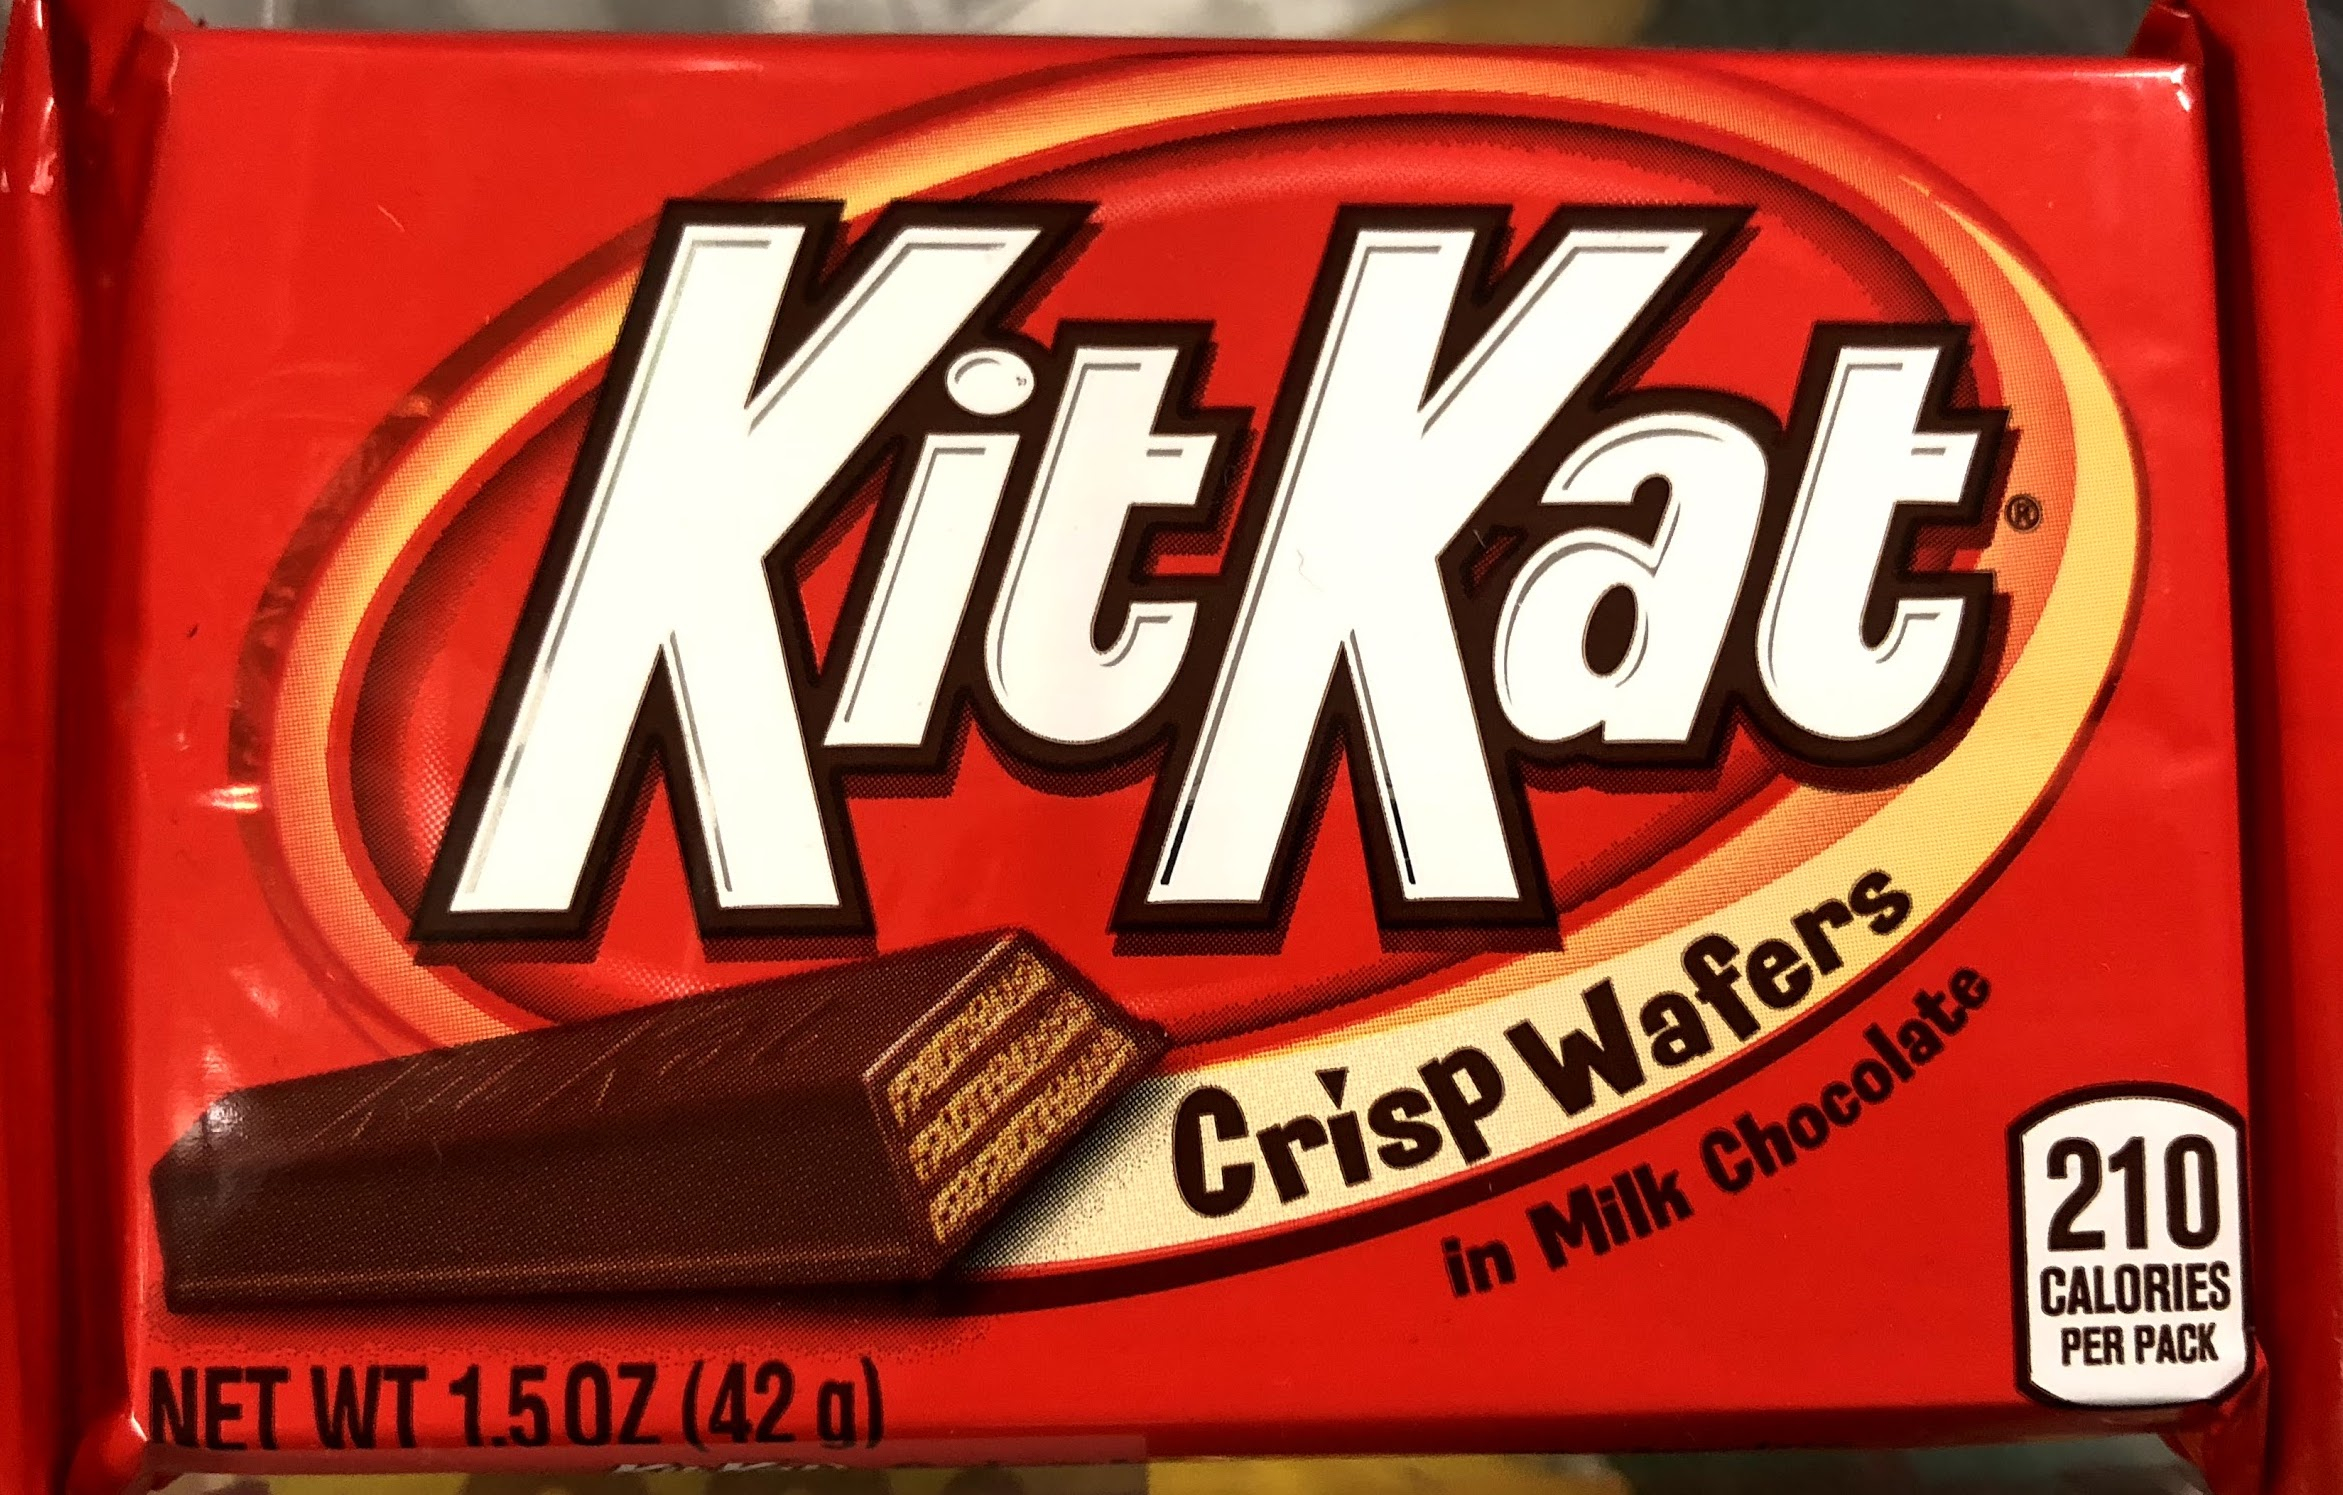 Cvs Chocolate Class